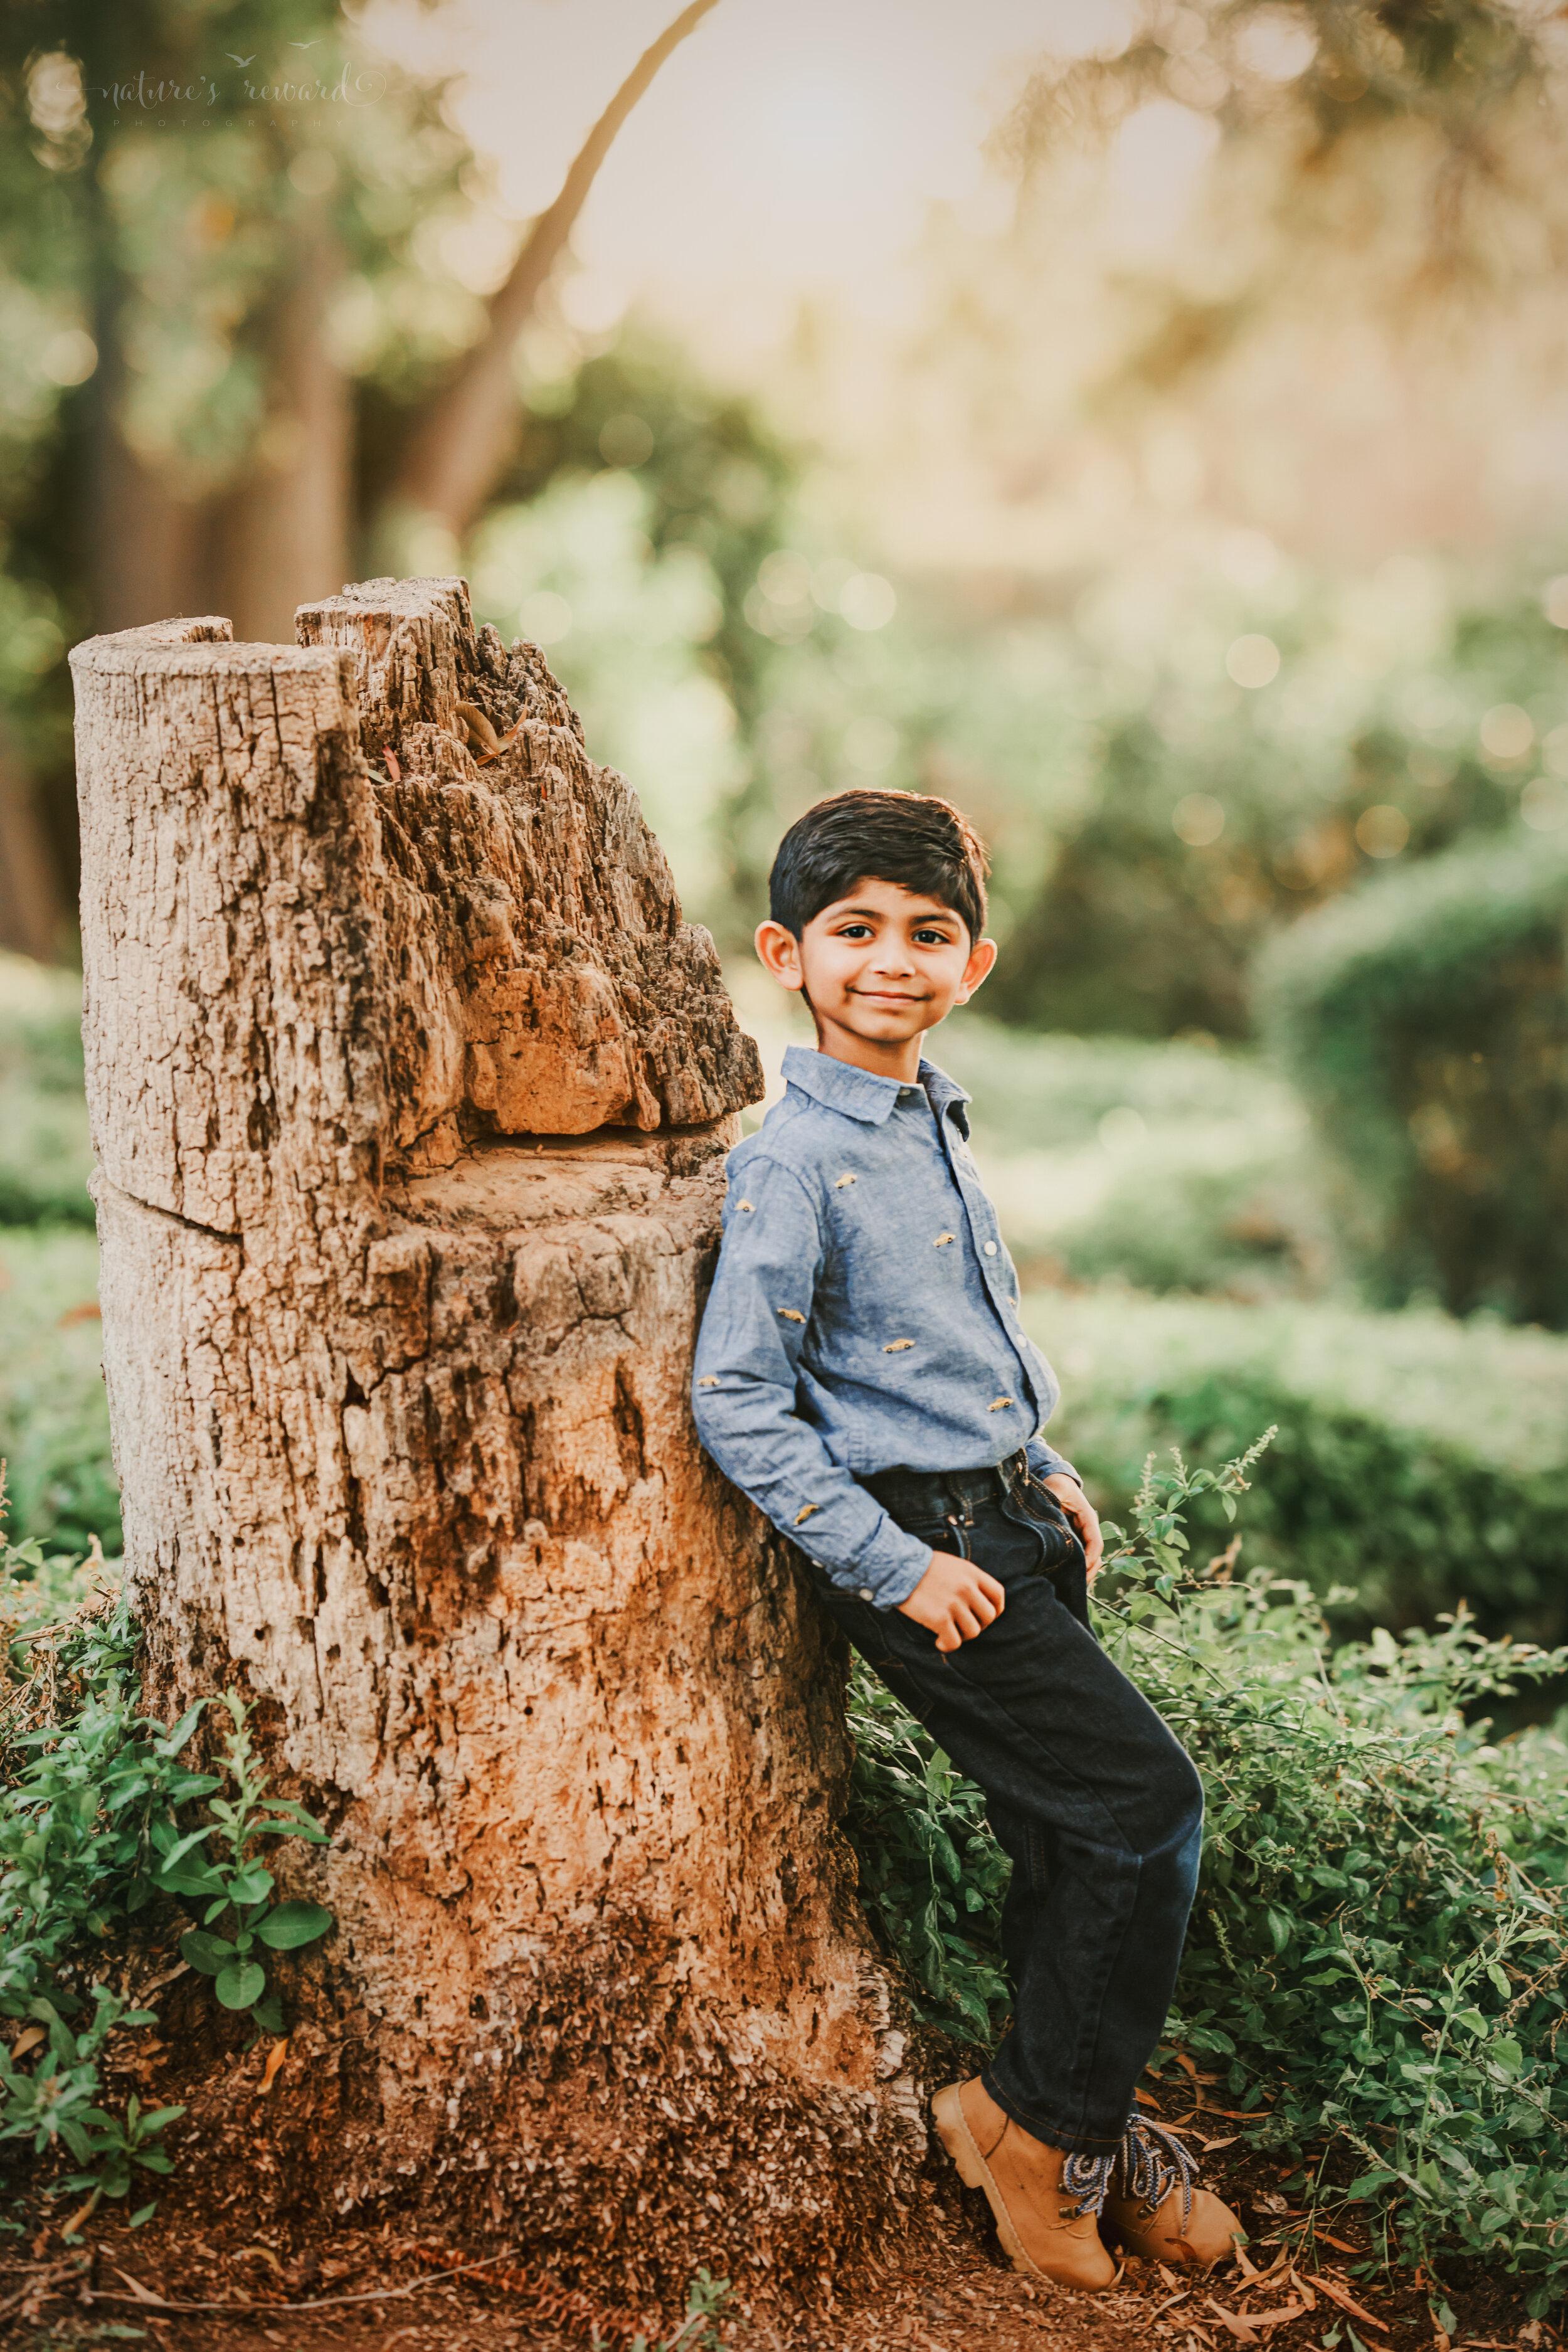 Fall child's portrait in a lush green park in redlands California, by San Bernardino photographer, Nature's Reward Photography.